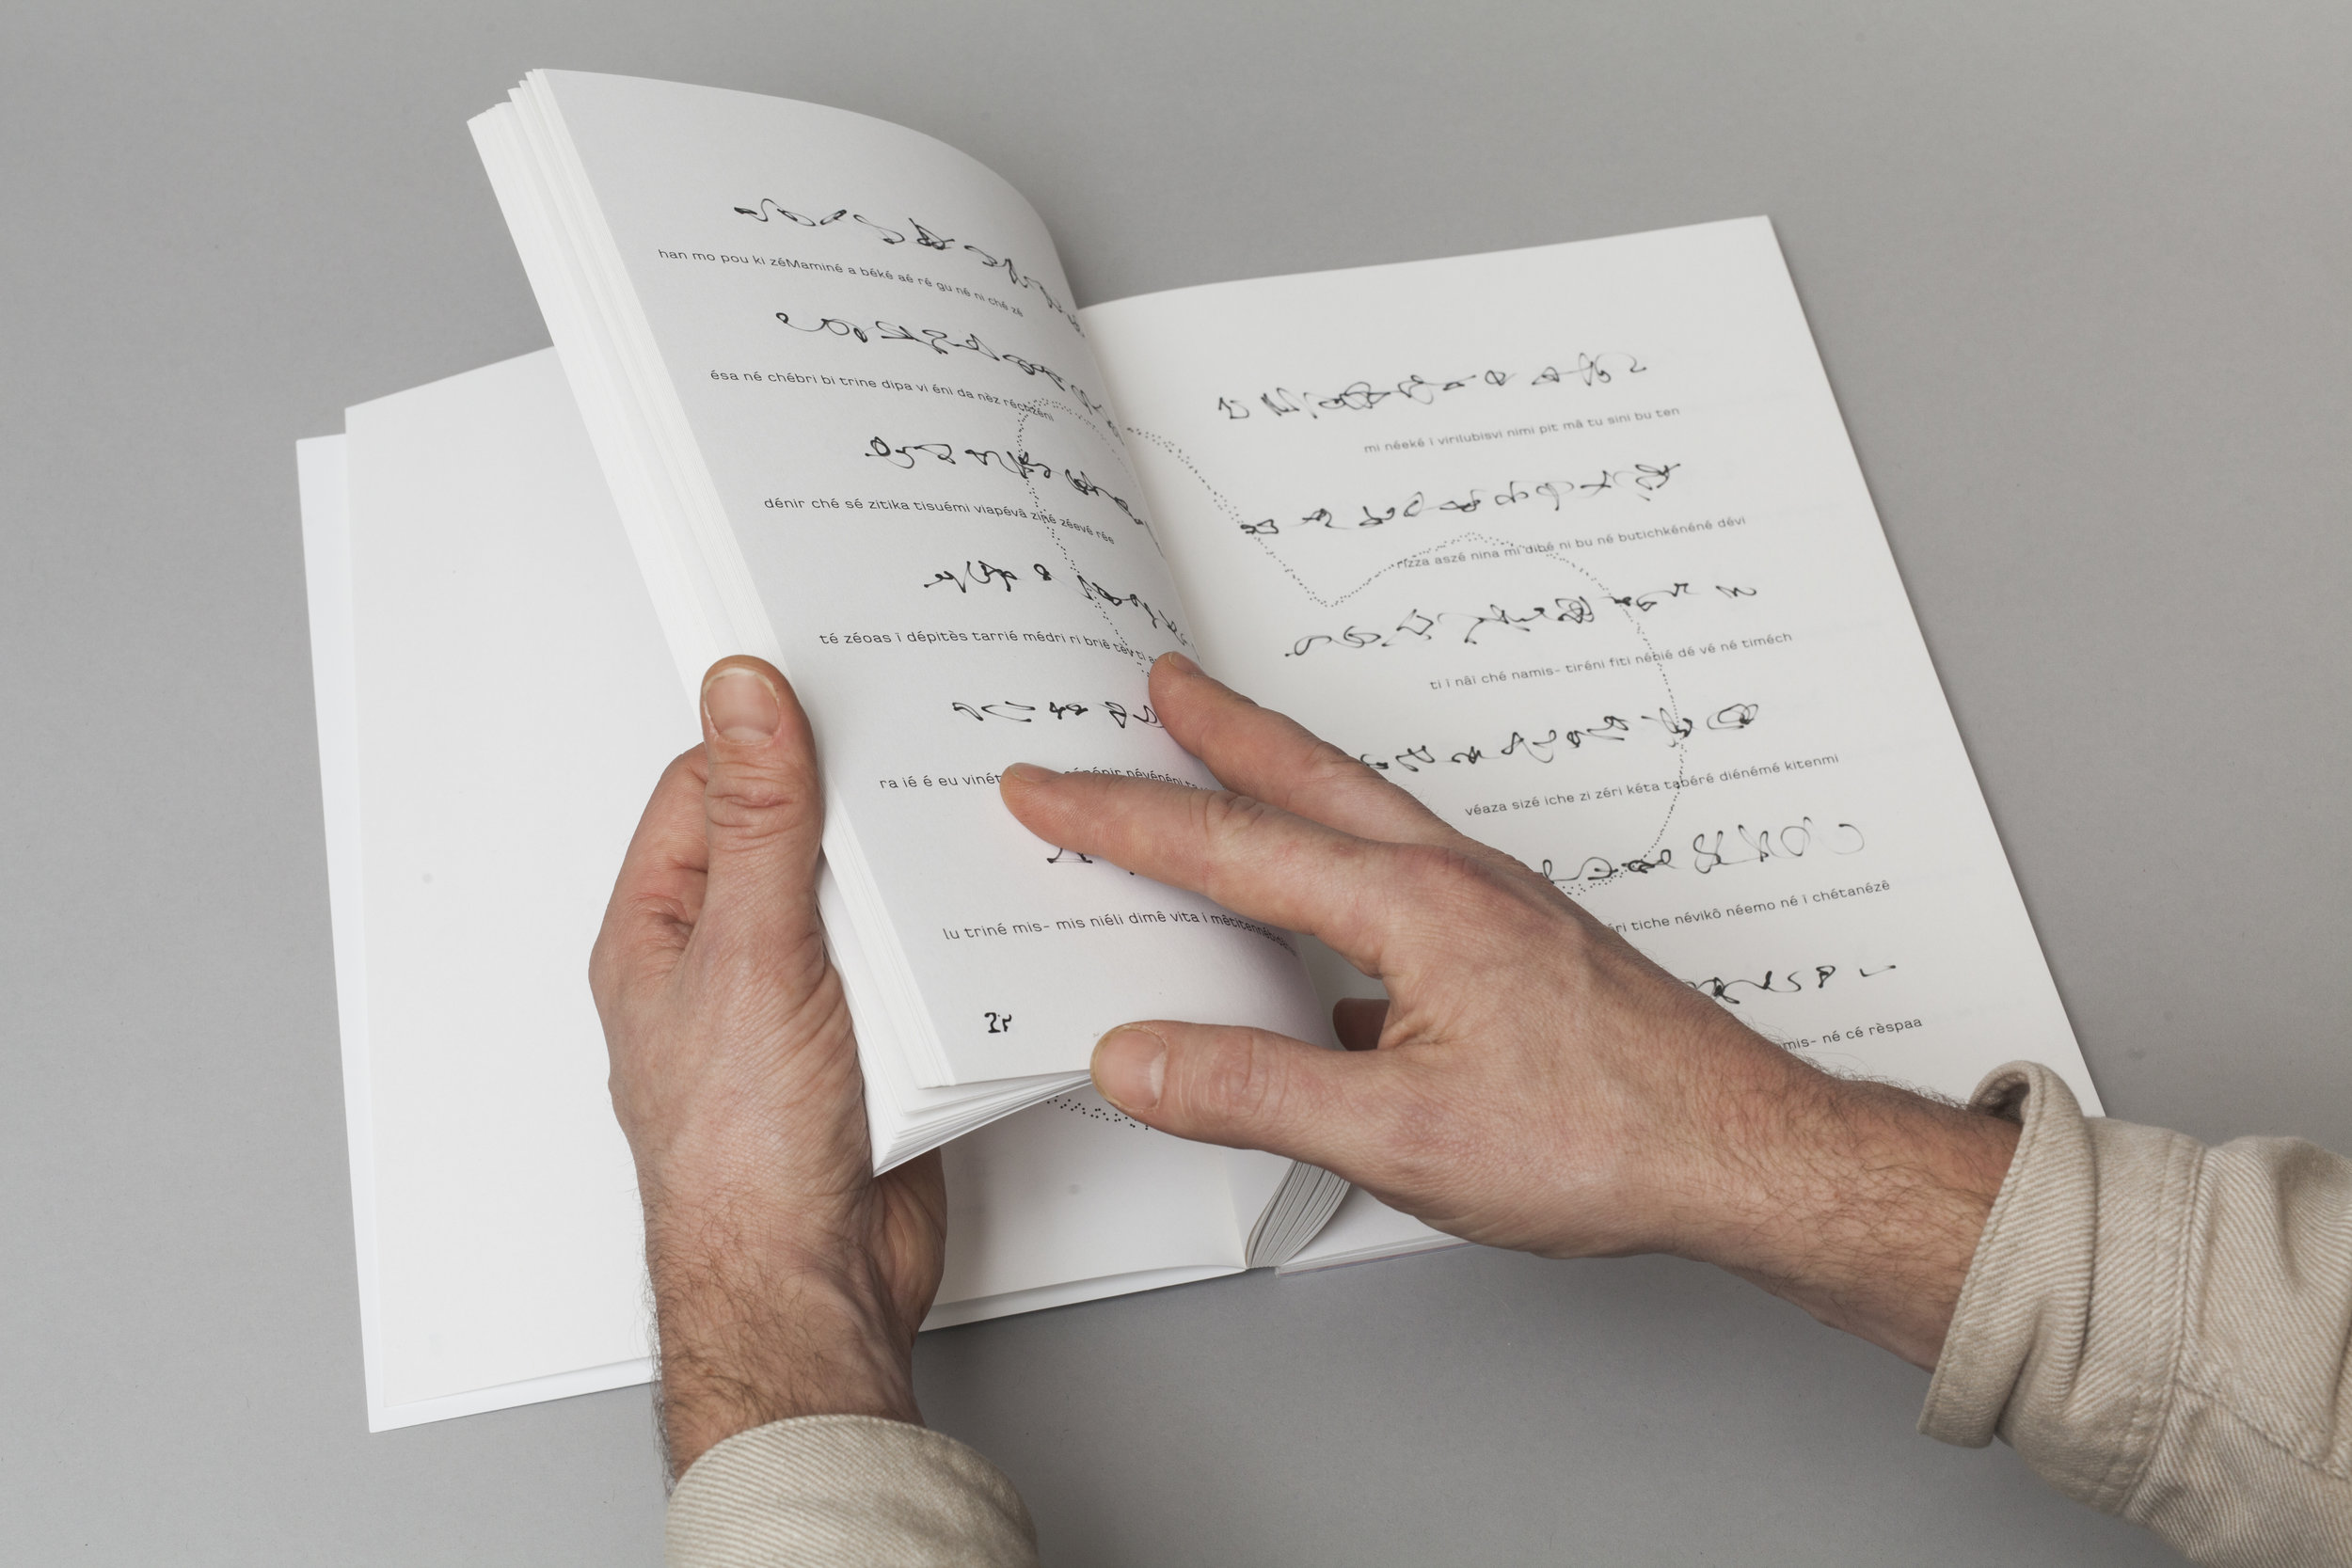 Jenna Sutela,  nimiia ïzinibimi , artist book at Central Library Oodi, Helsinki, 2019